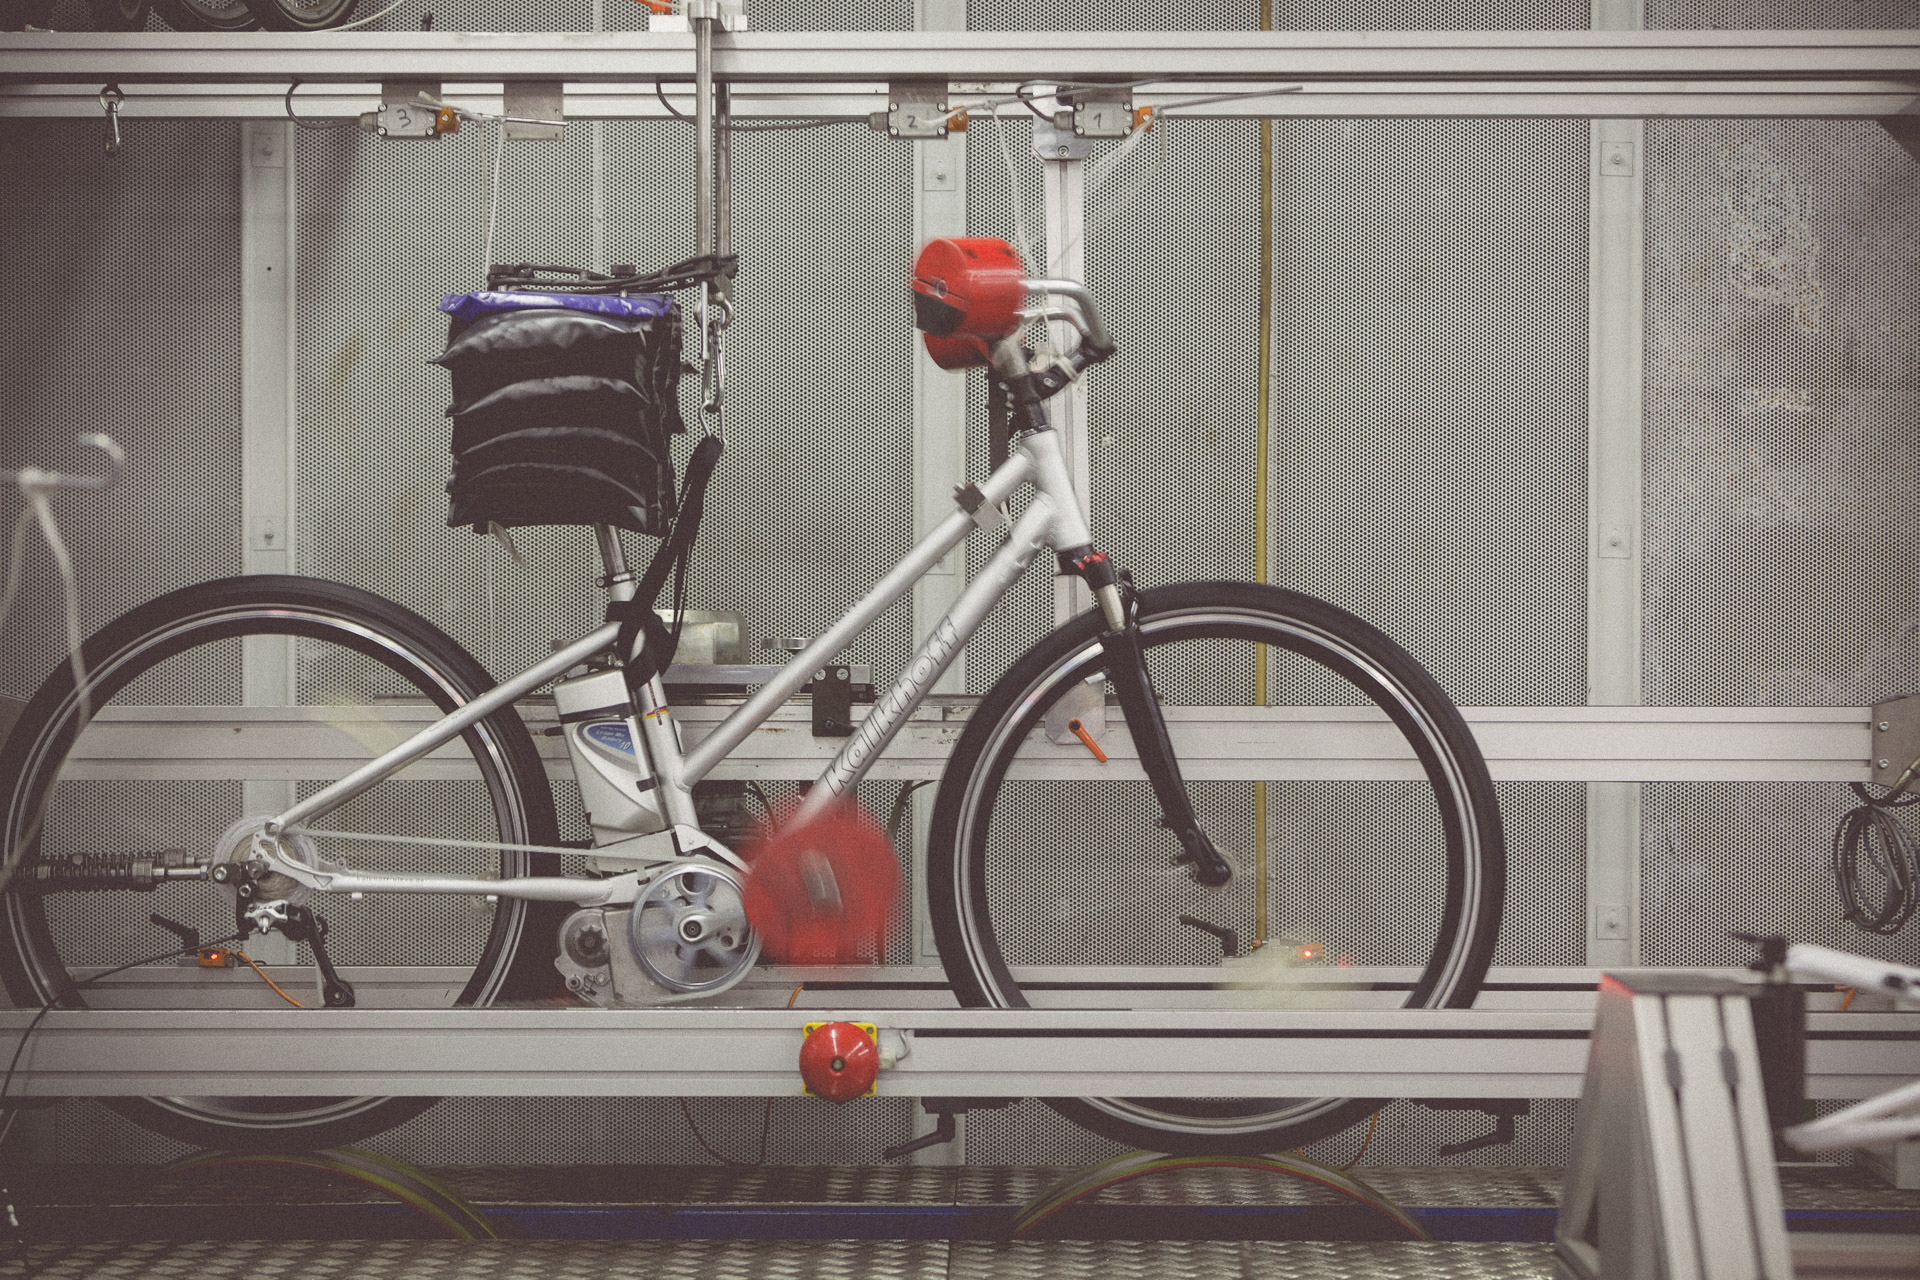 45-Derby-Cycle-Werke-Fahrradproduktion